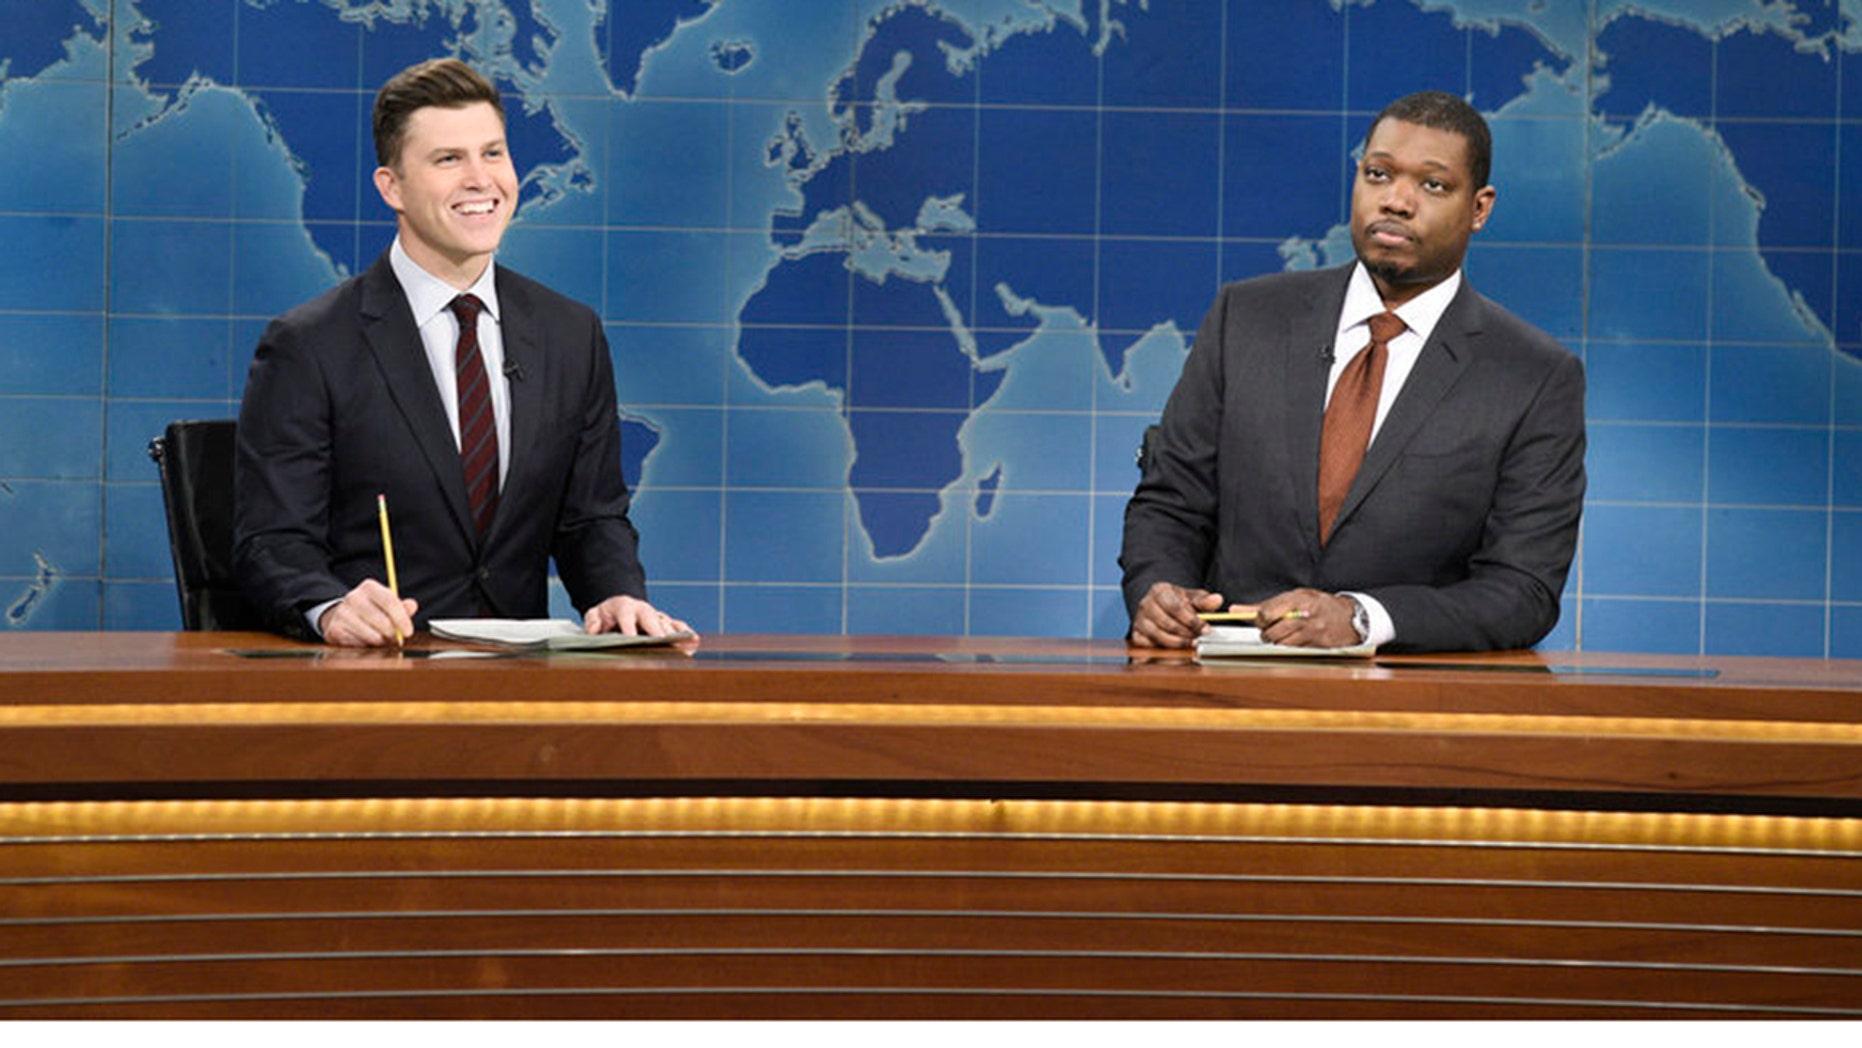 'SNL' takes rare jabs at Biden, liberals in 'Weekend Update' segment